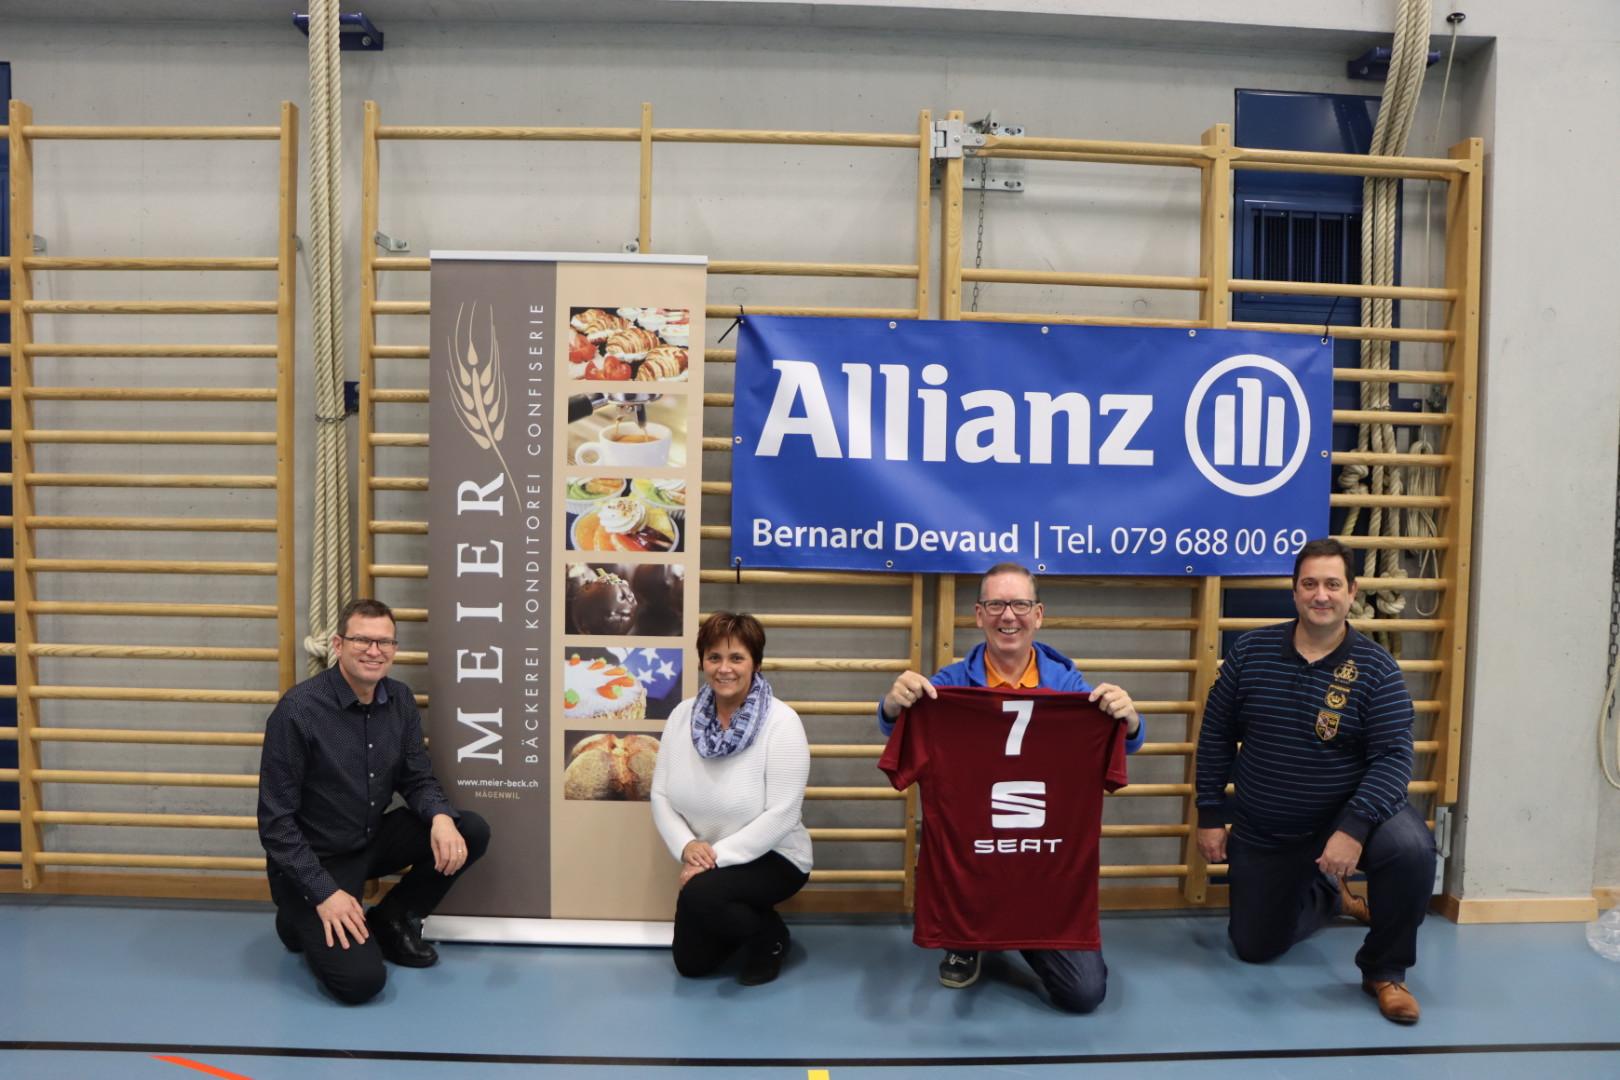 Dank an unseren Sponsoren Meier Bäckerei, Allianz und Seat